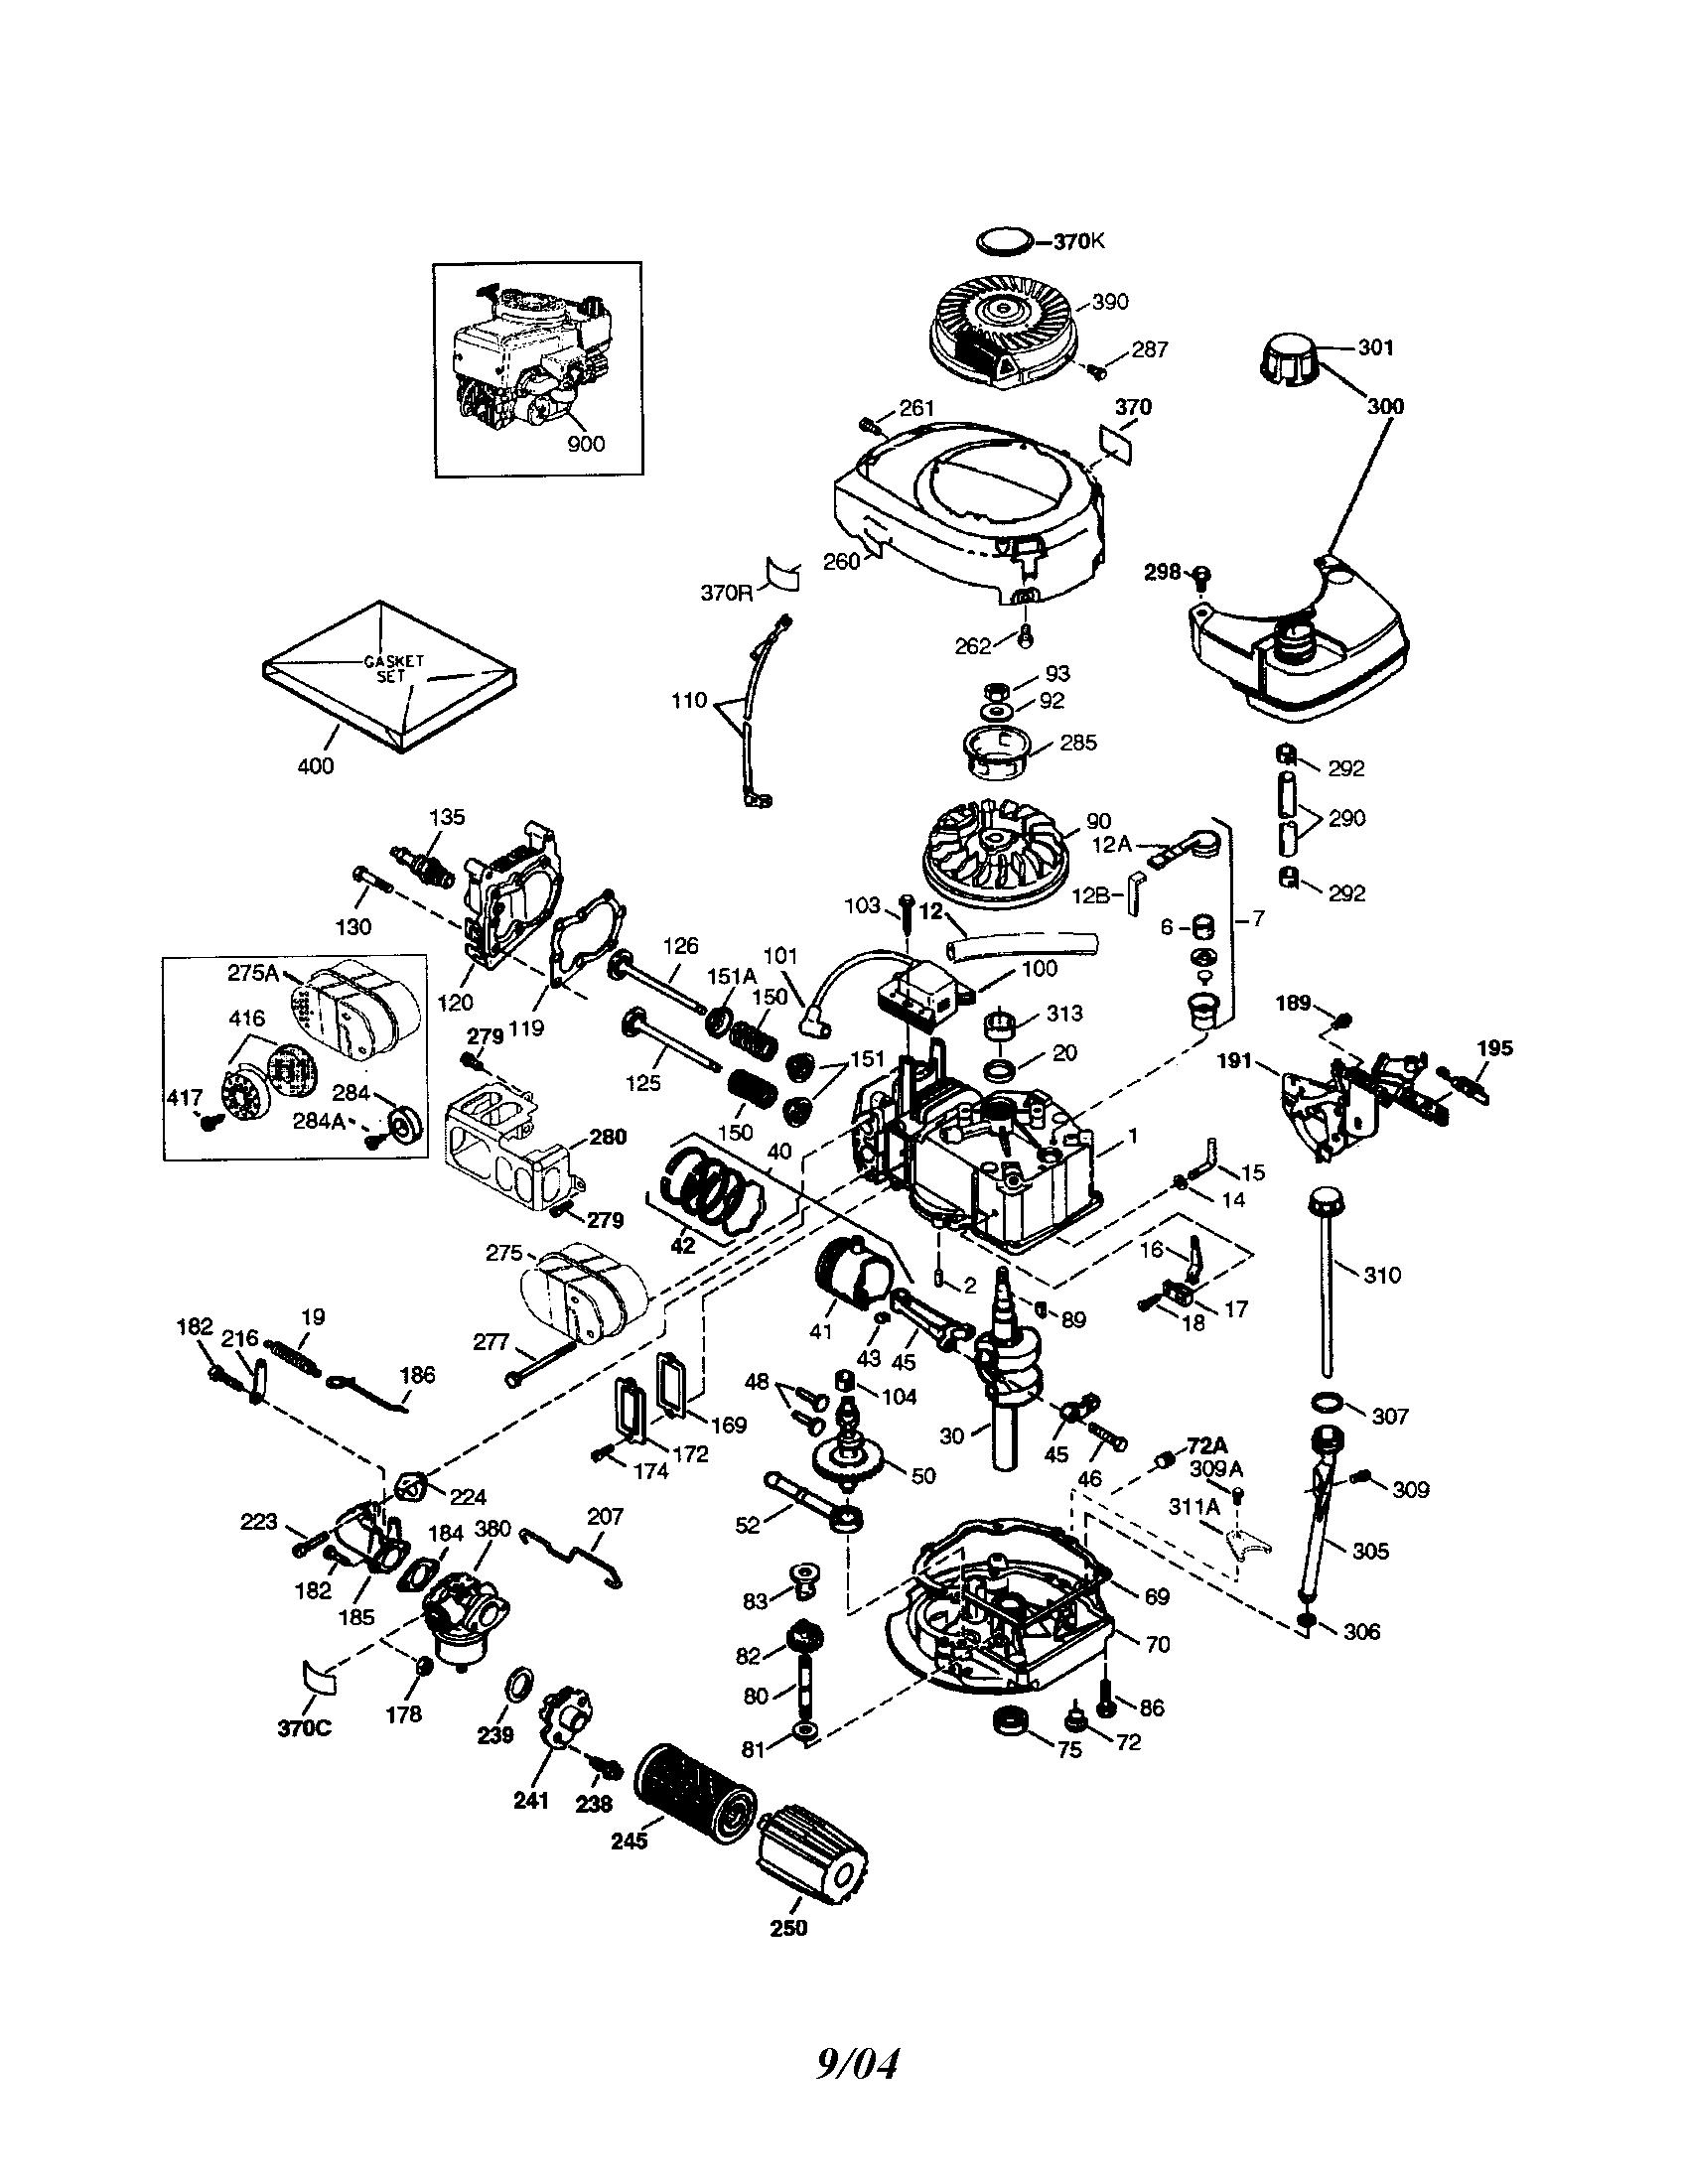 rebuild tecumseh carburetor diagram 1994 ford f150 wiring lookup beforebuying